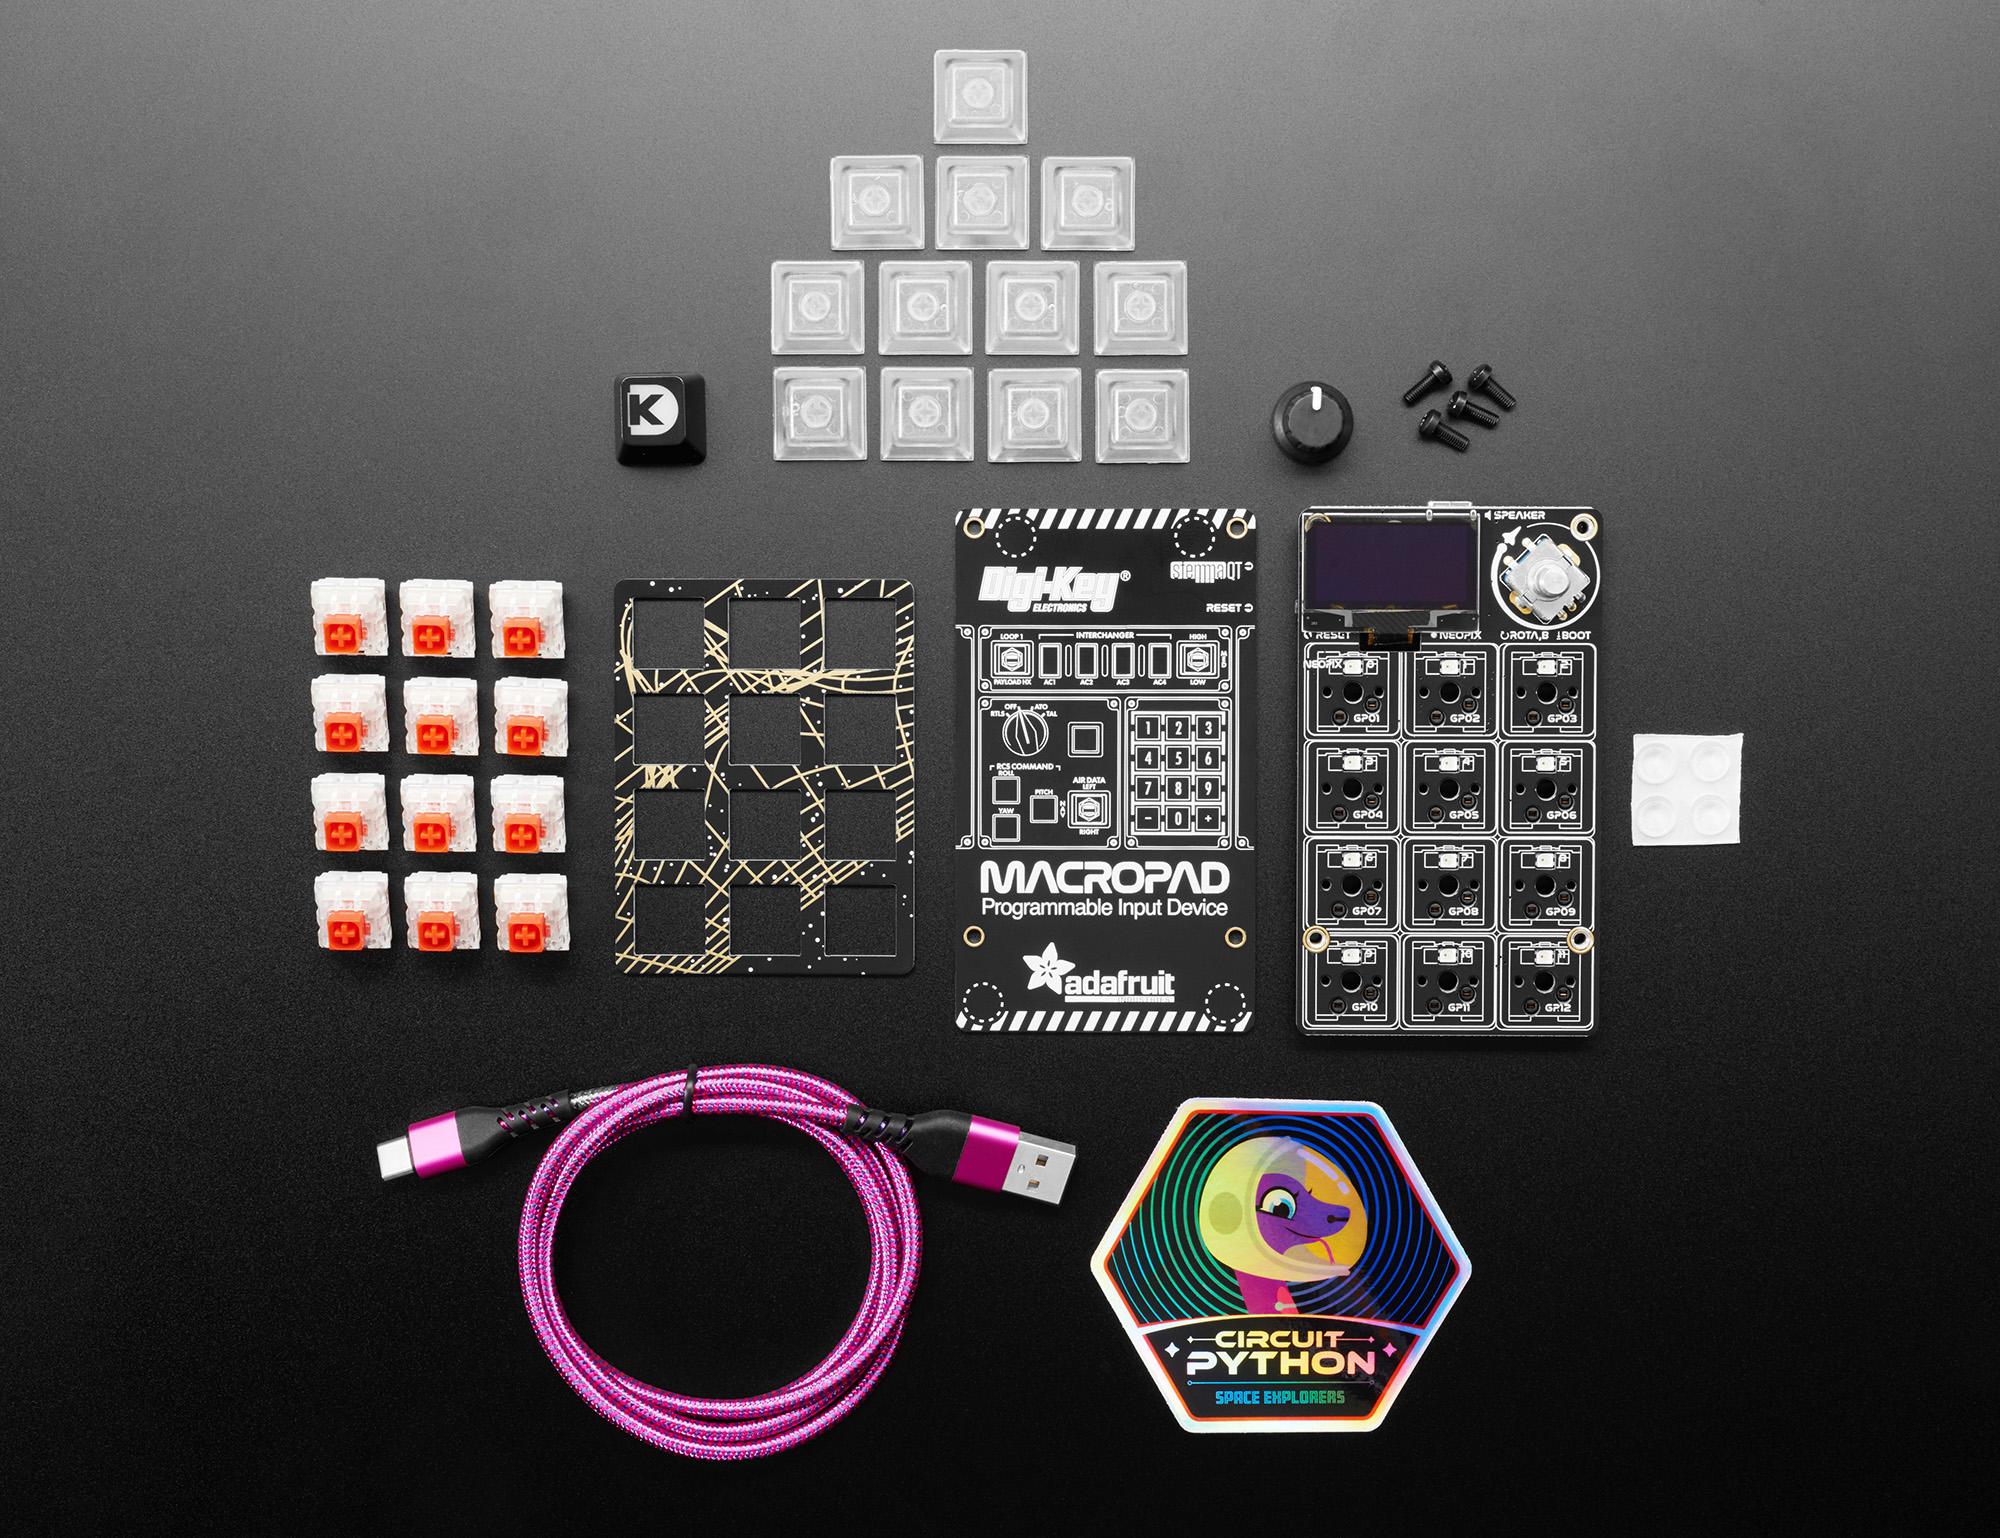 circuitpython_Adabox_19_kit_ORIG_2021_07_2k.jpg